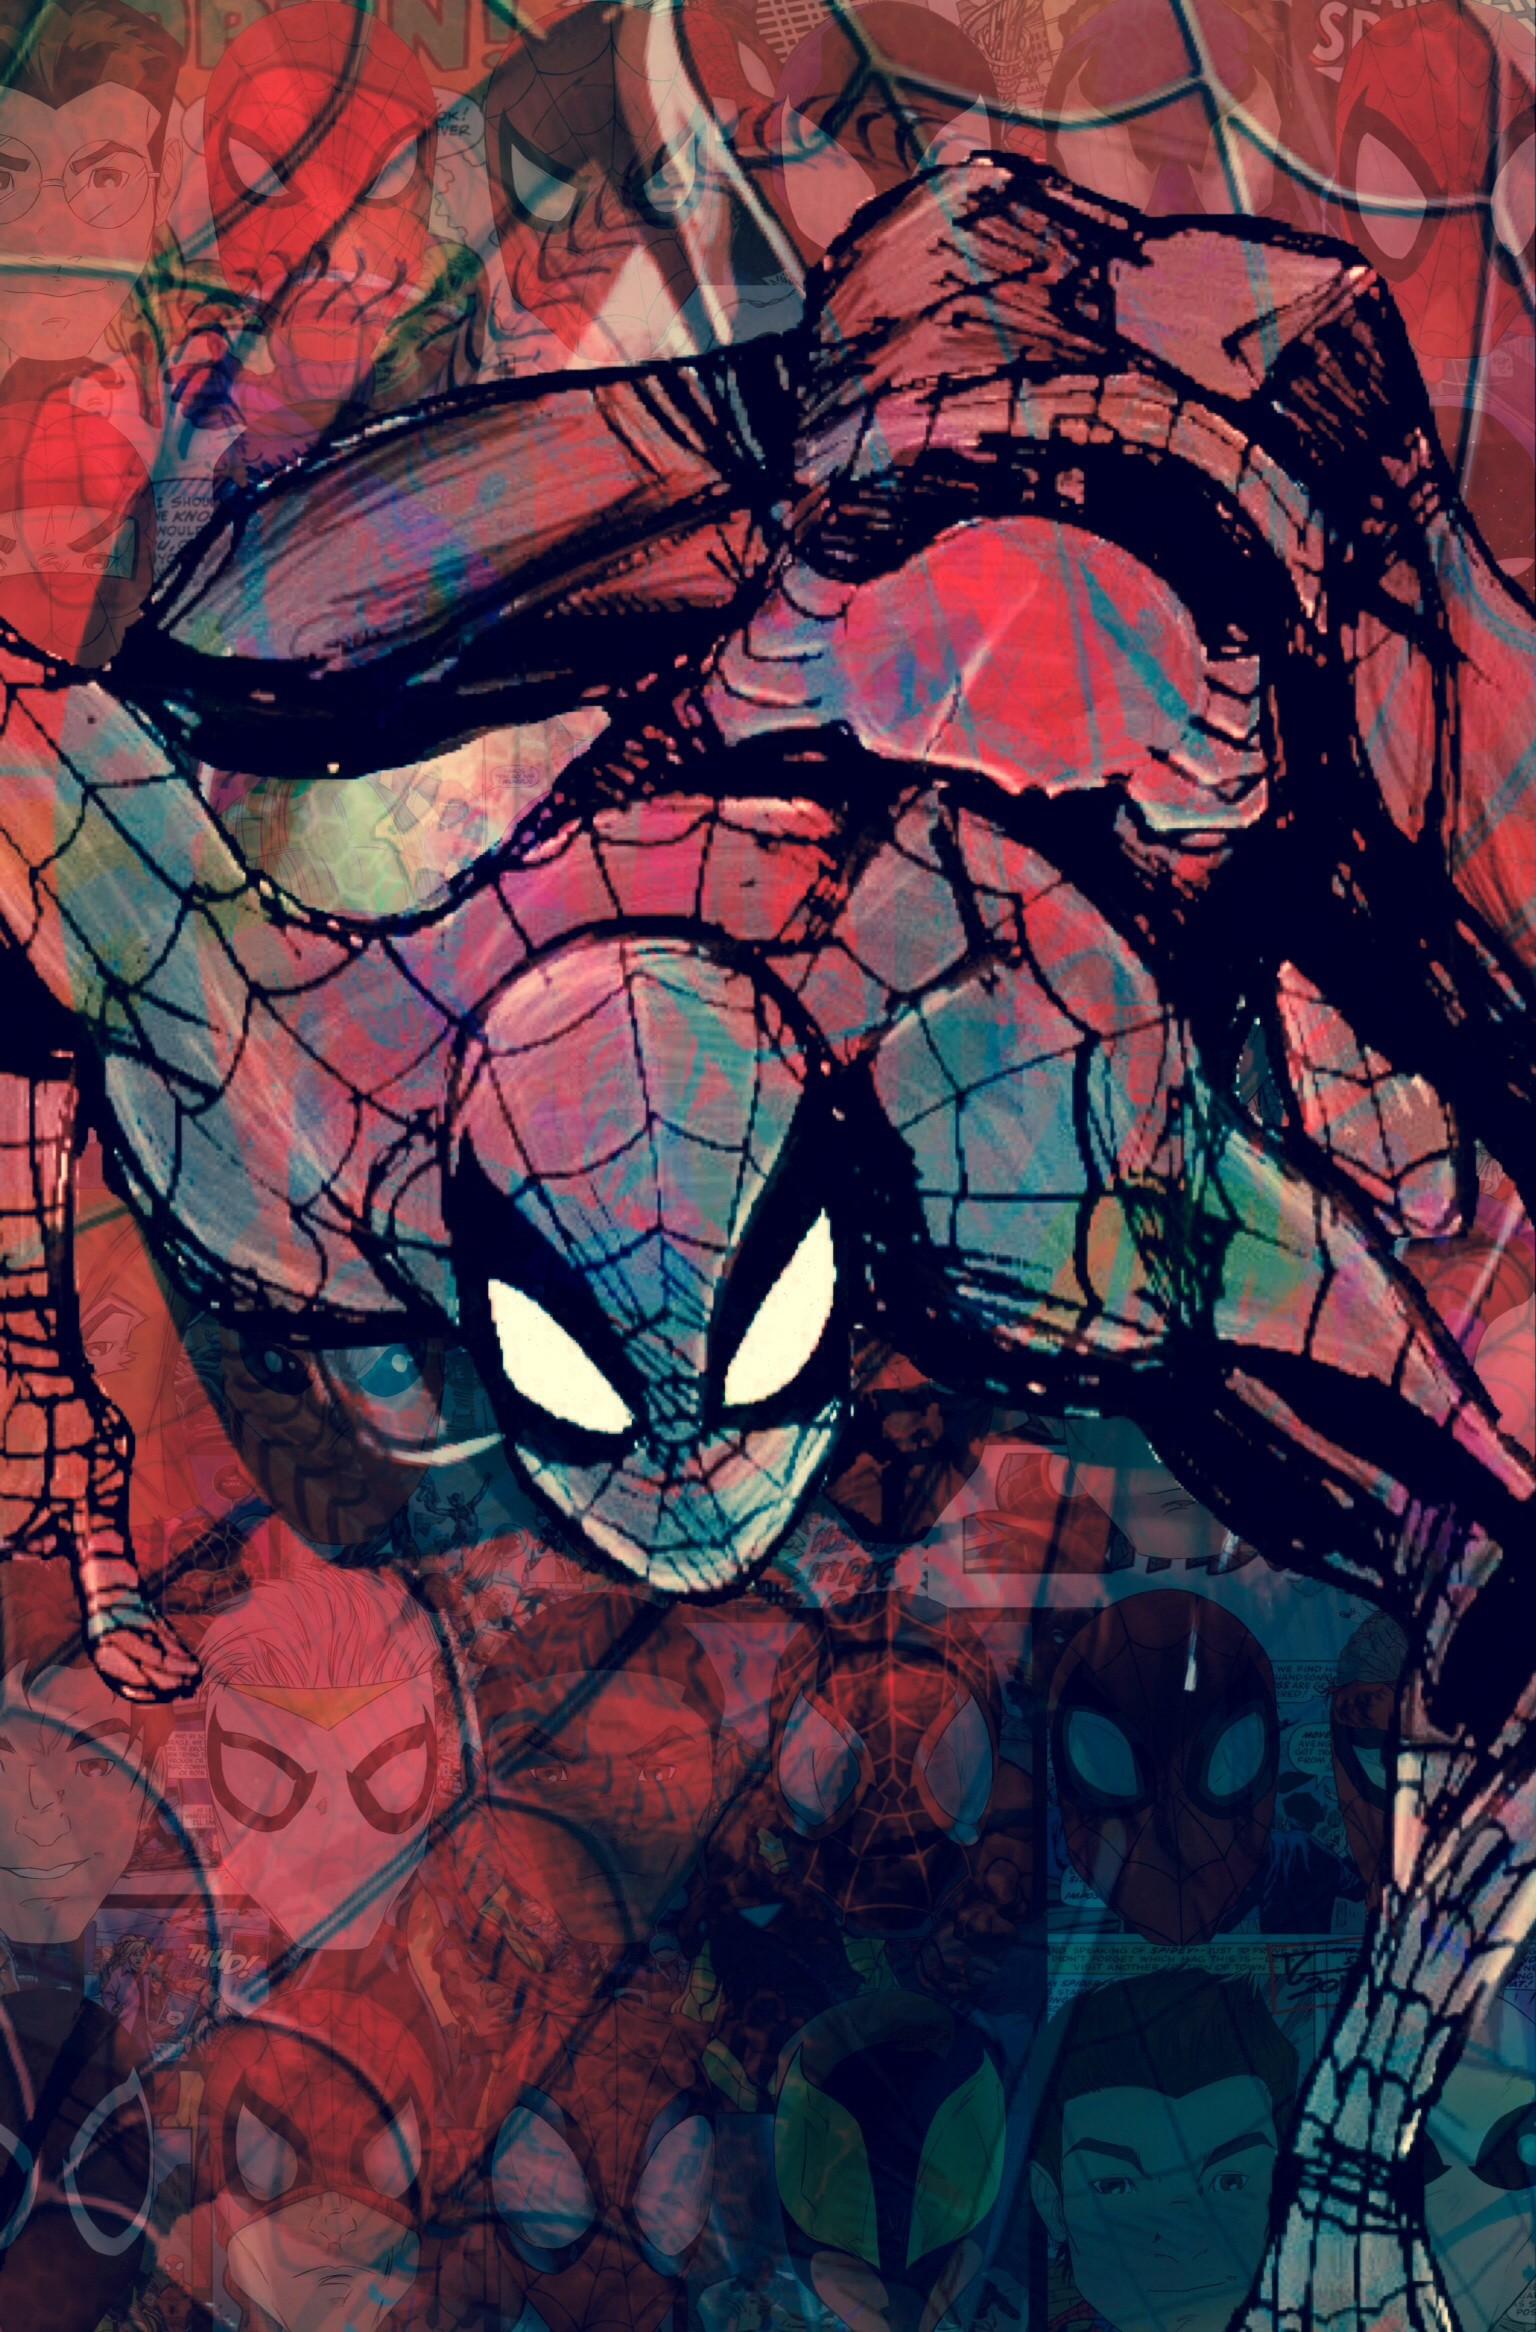 … Spiderman IOS Wallpaper by Joey-GB-316